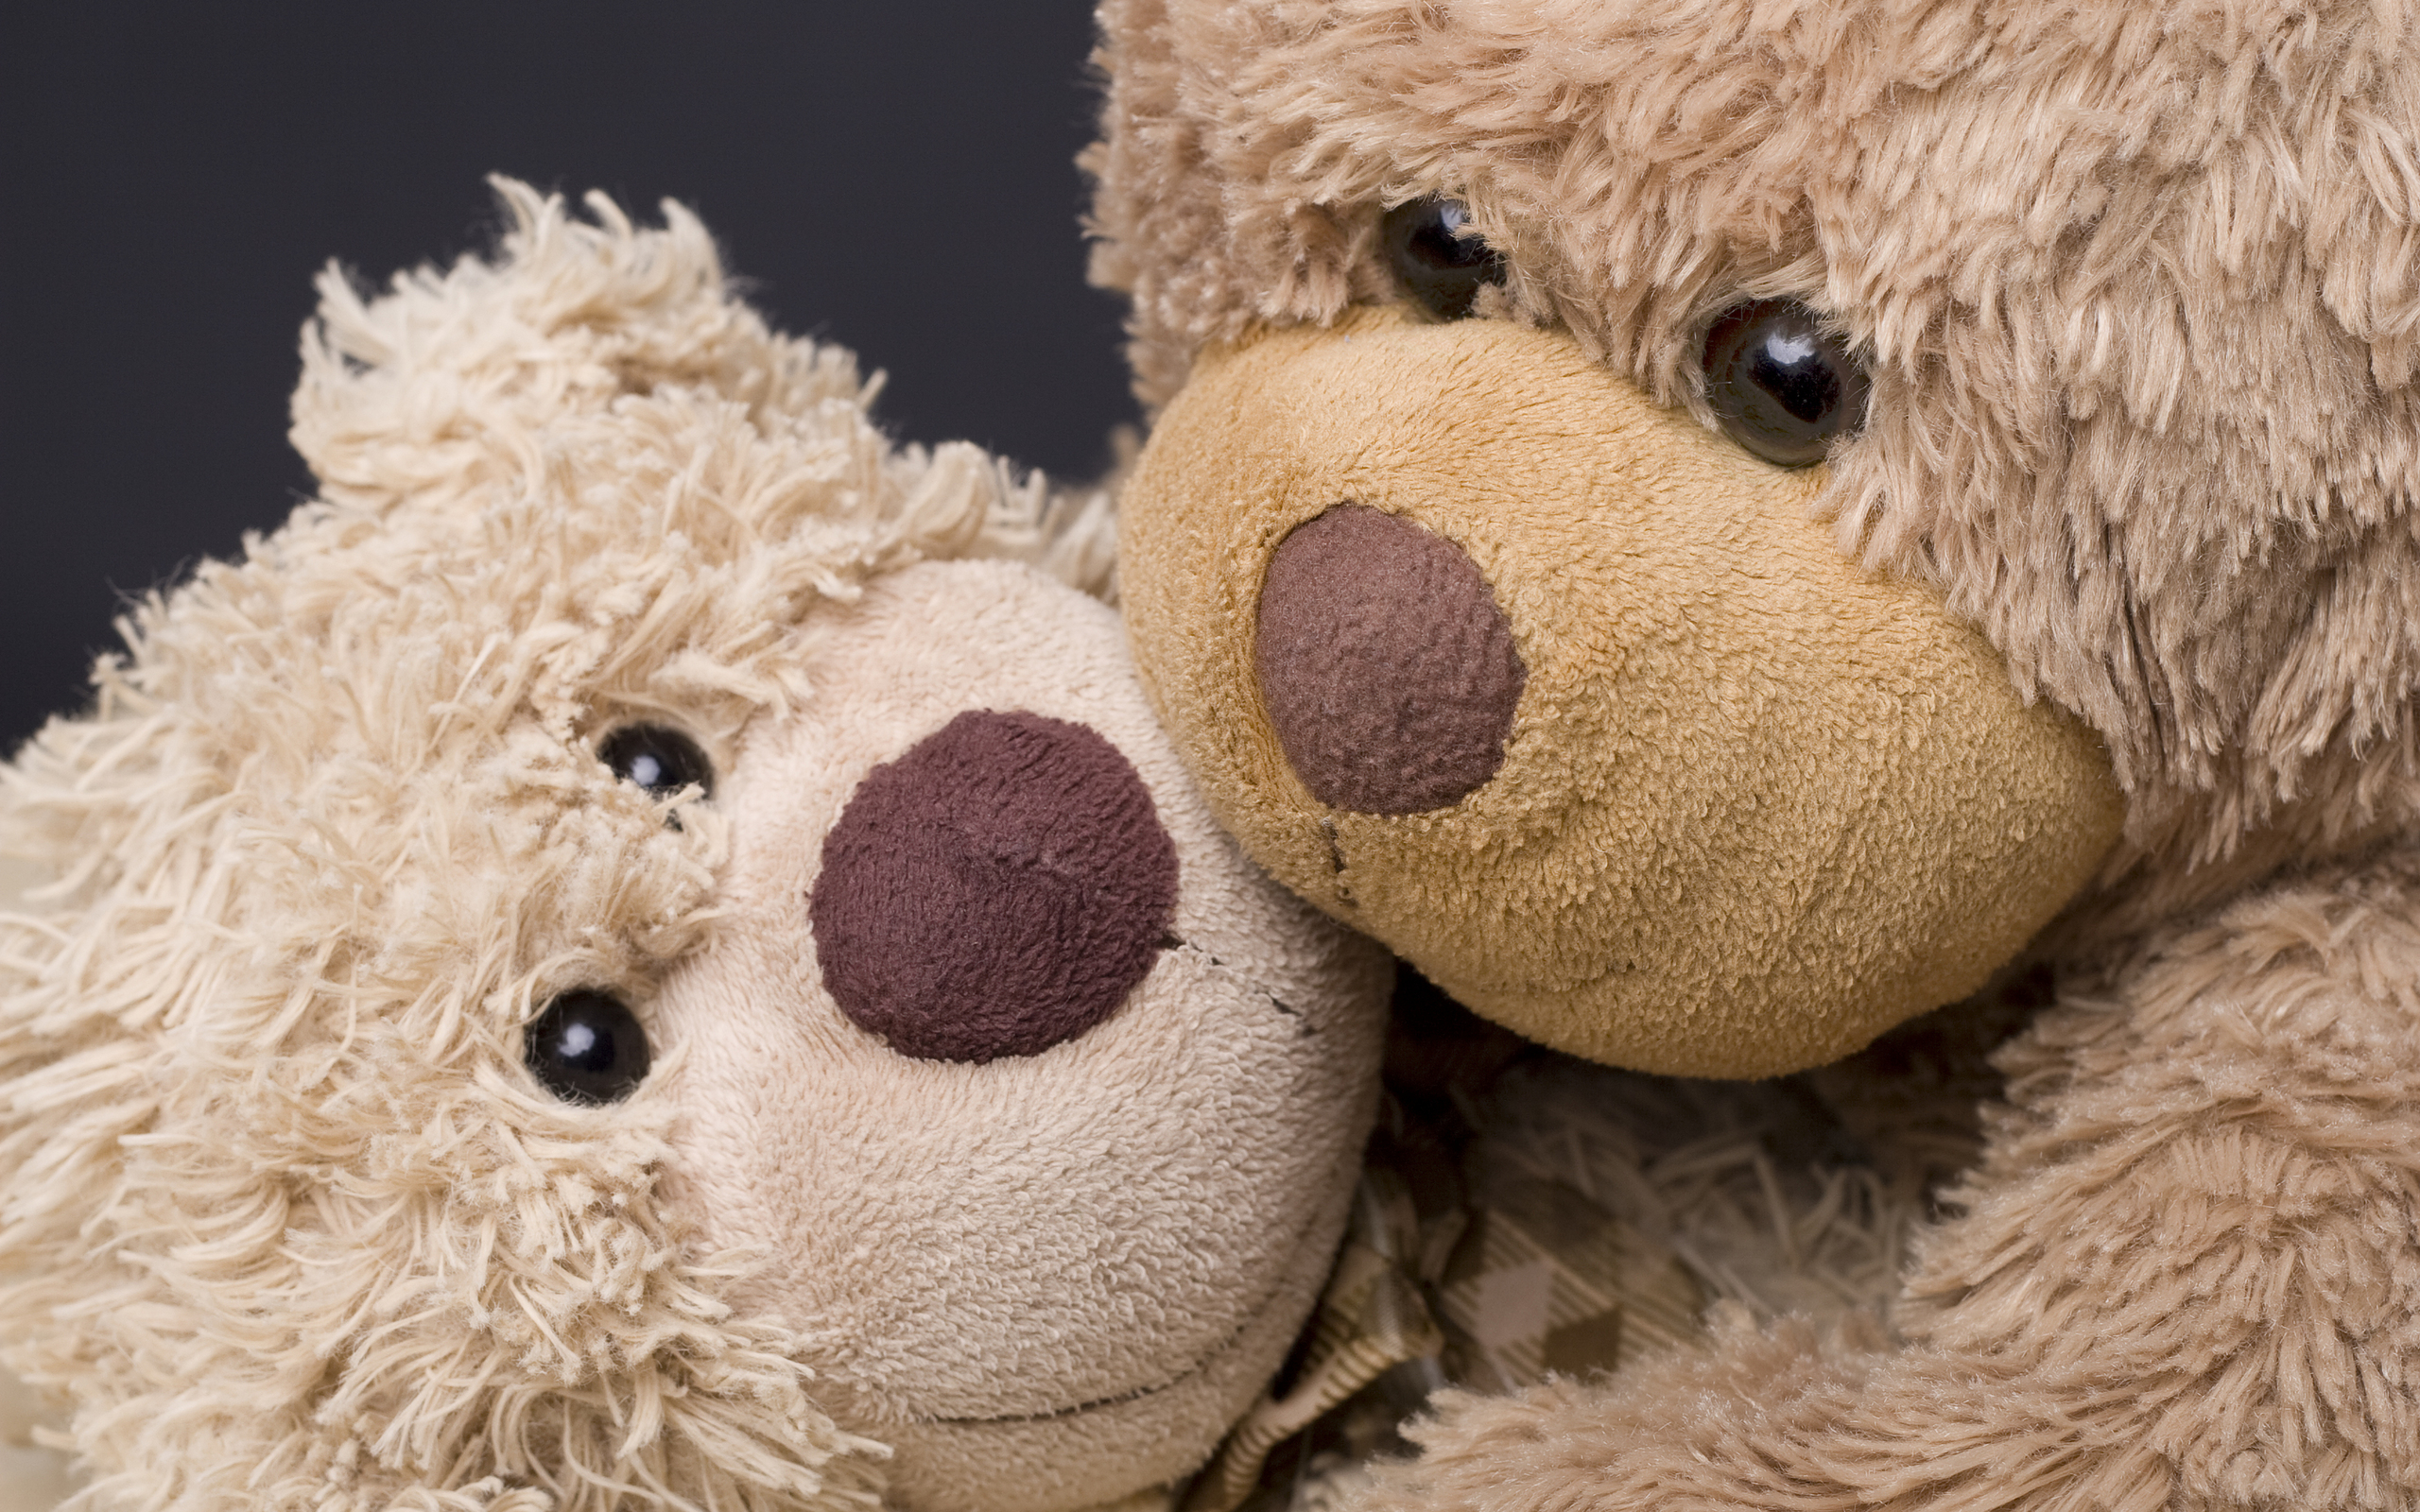 Teddy bears hd wallpaper background image 2560x1600 id 271162 wallpaper abyss - Free teddy bear pics ...